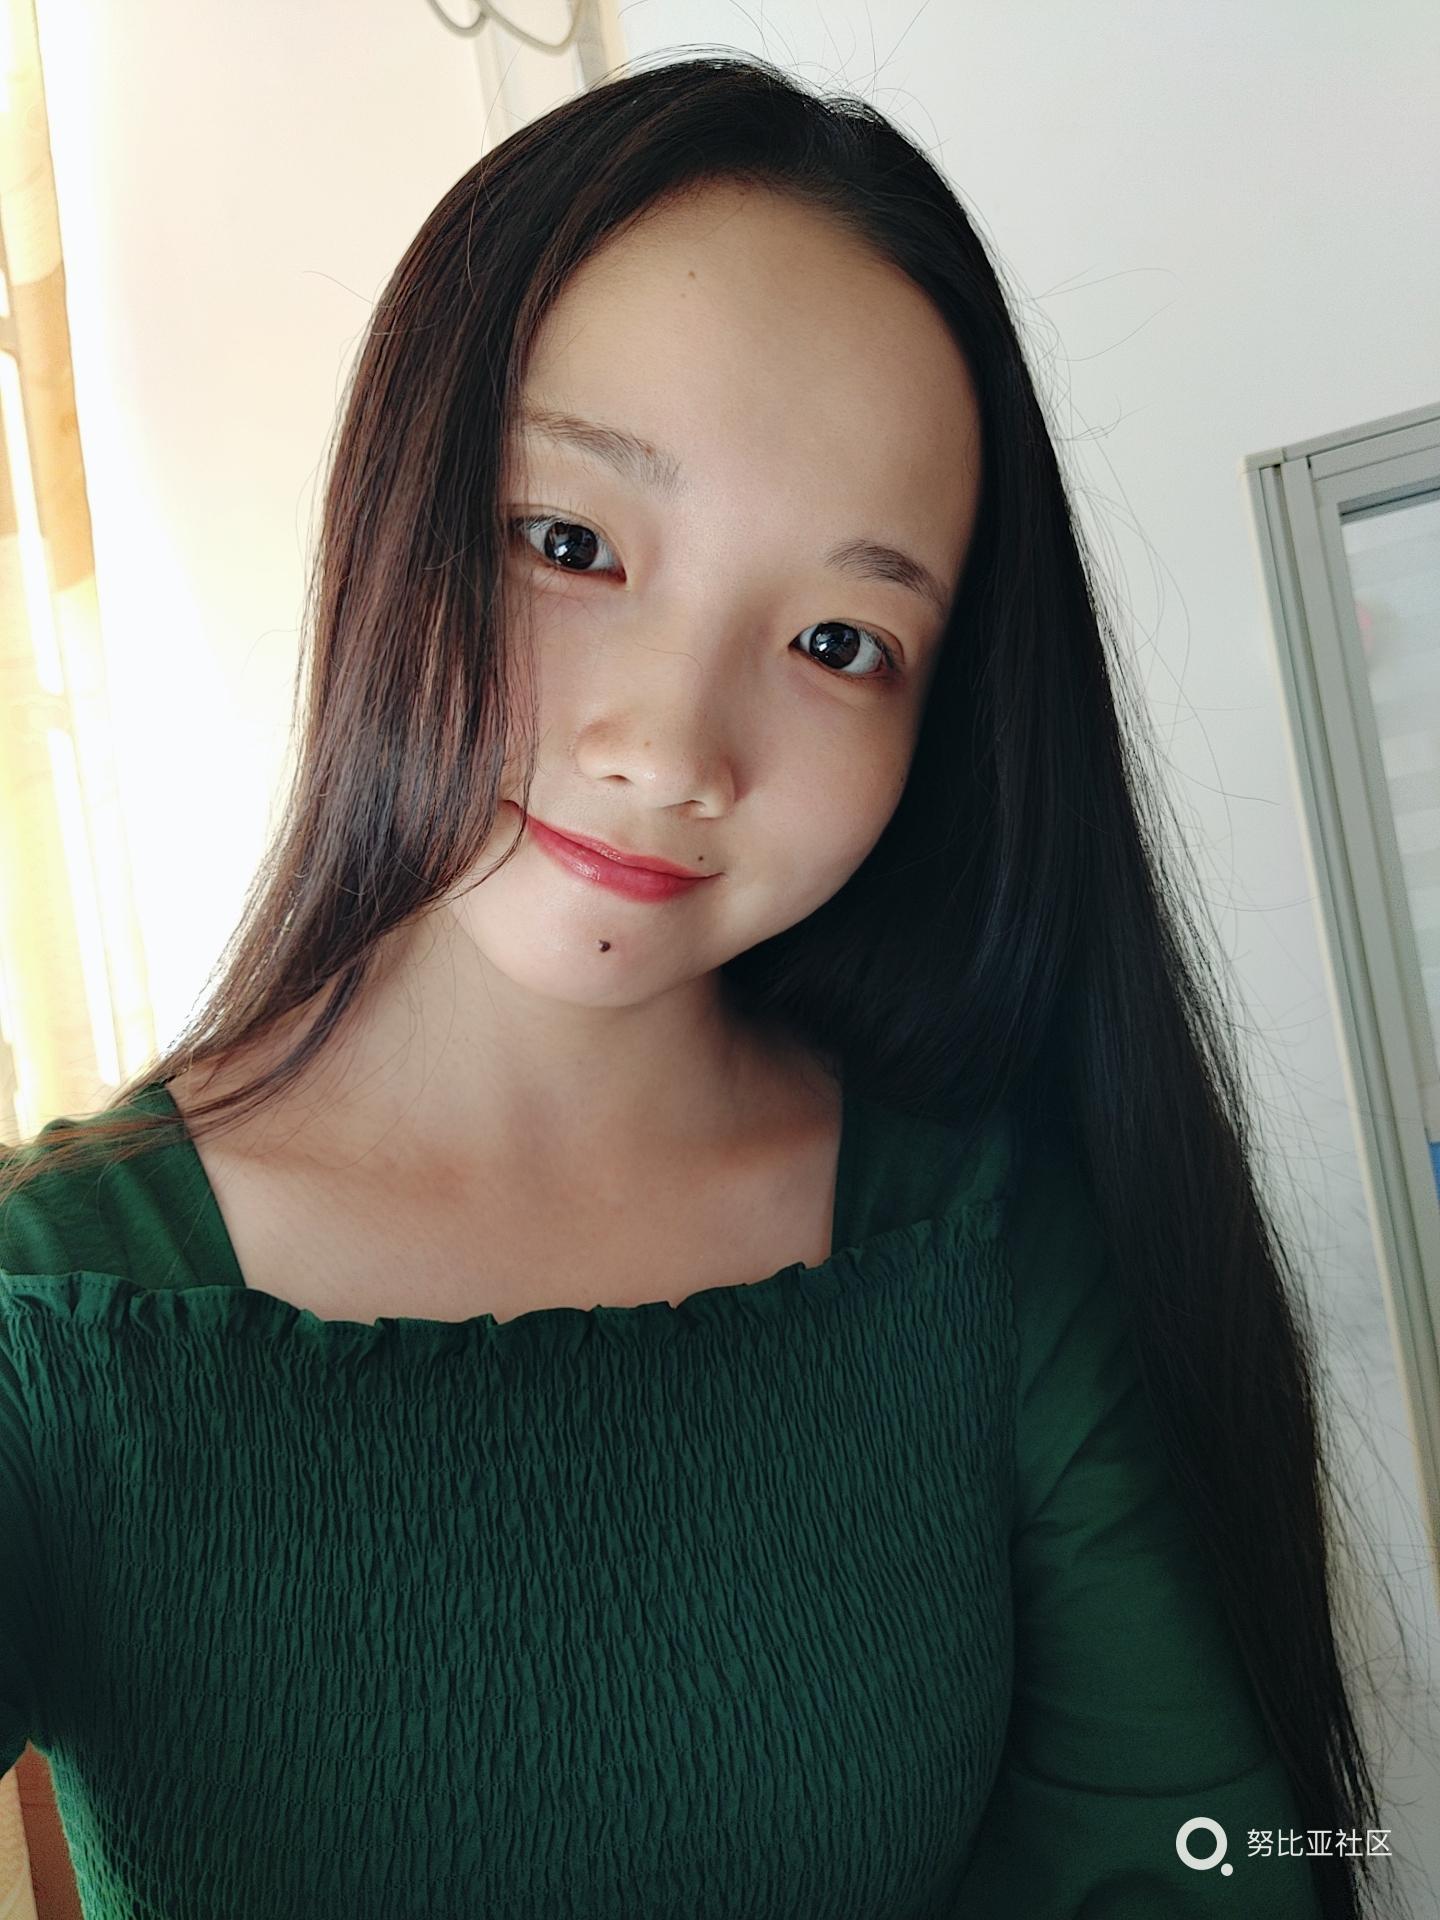 MYXJ_20190904152010_fast.jpg